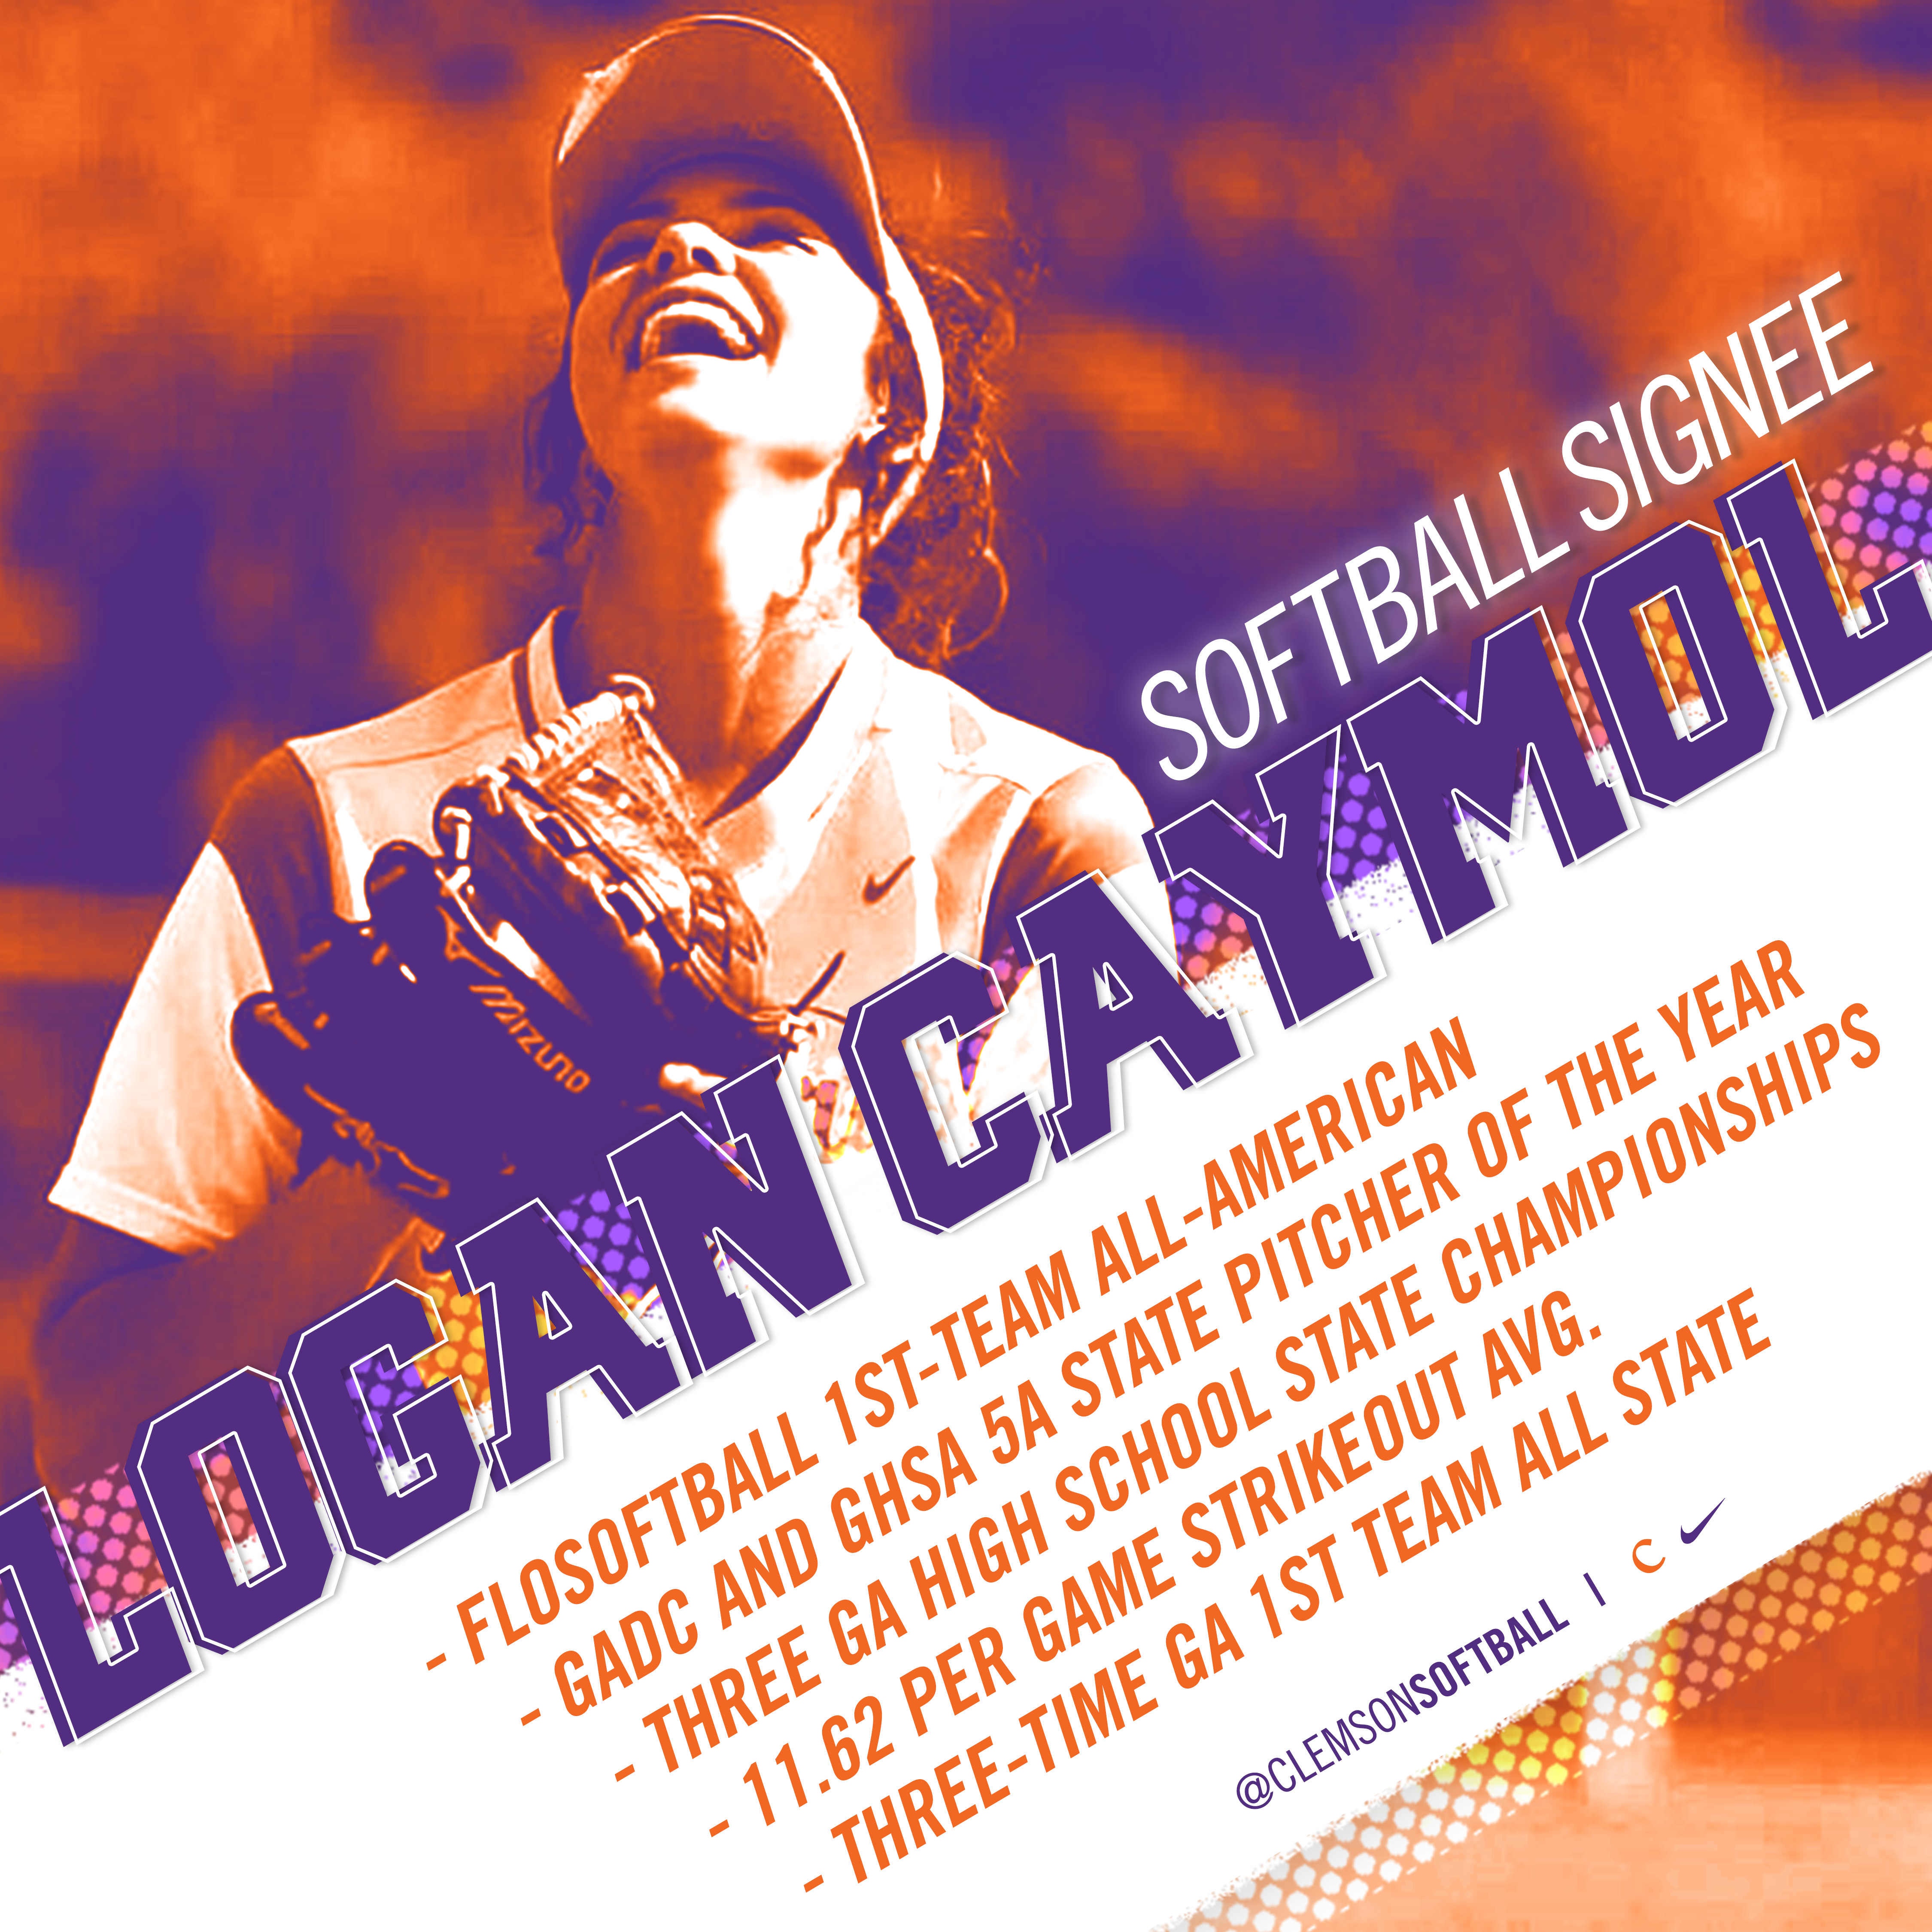 Logan Caymol Inks as First Softball Signee